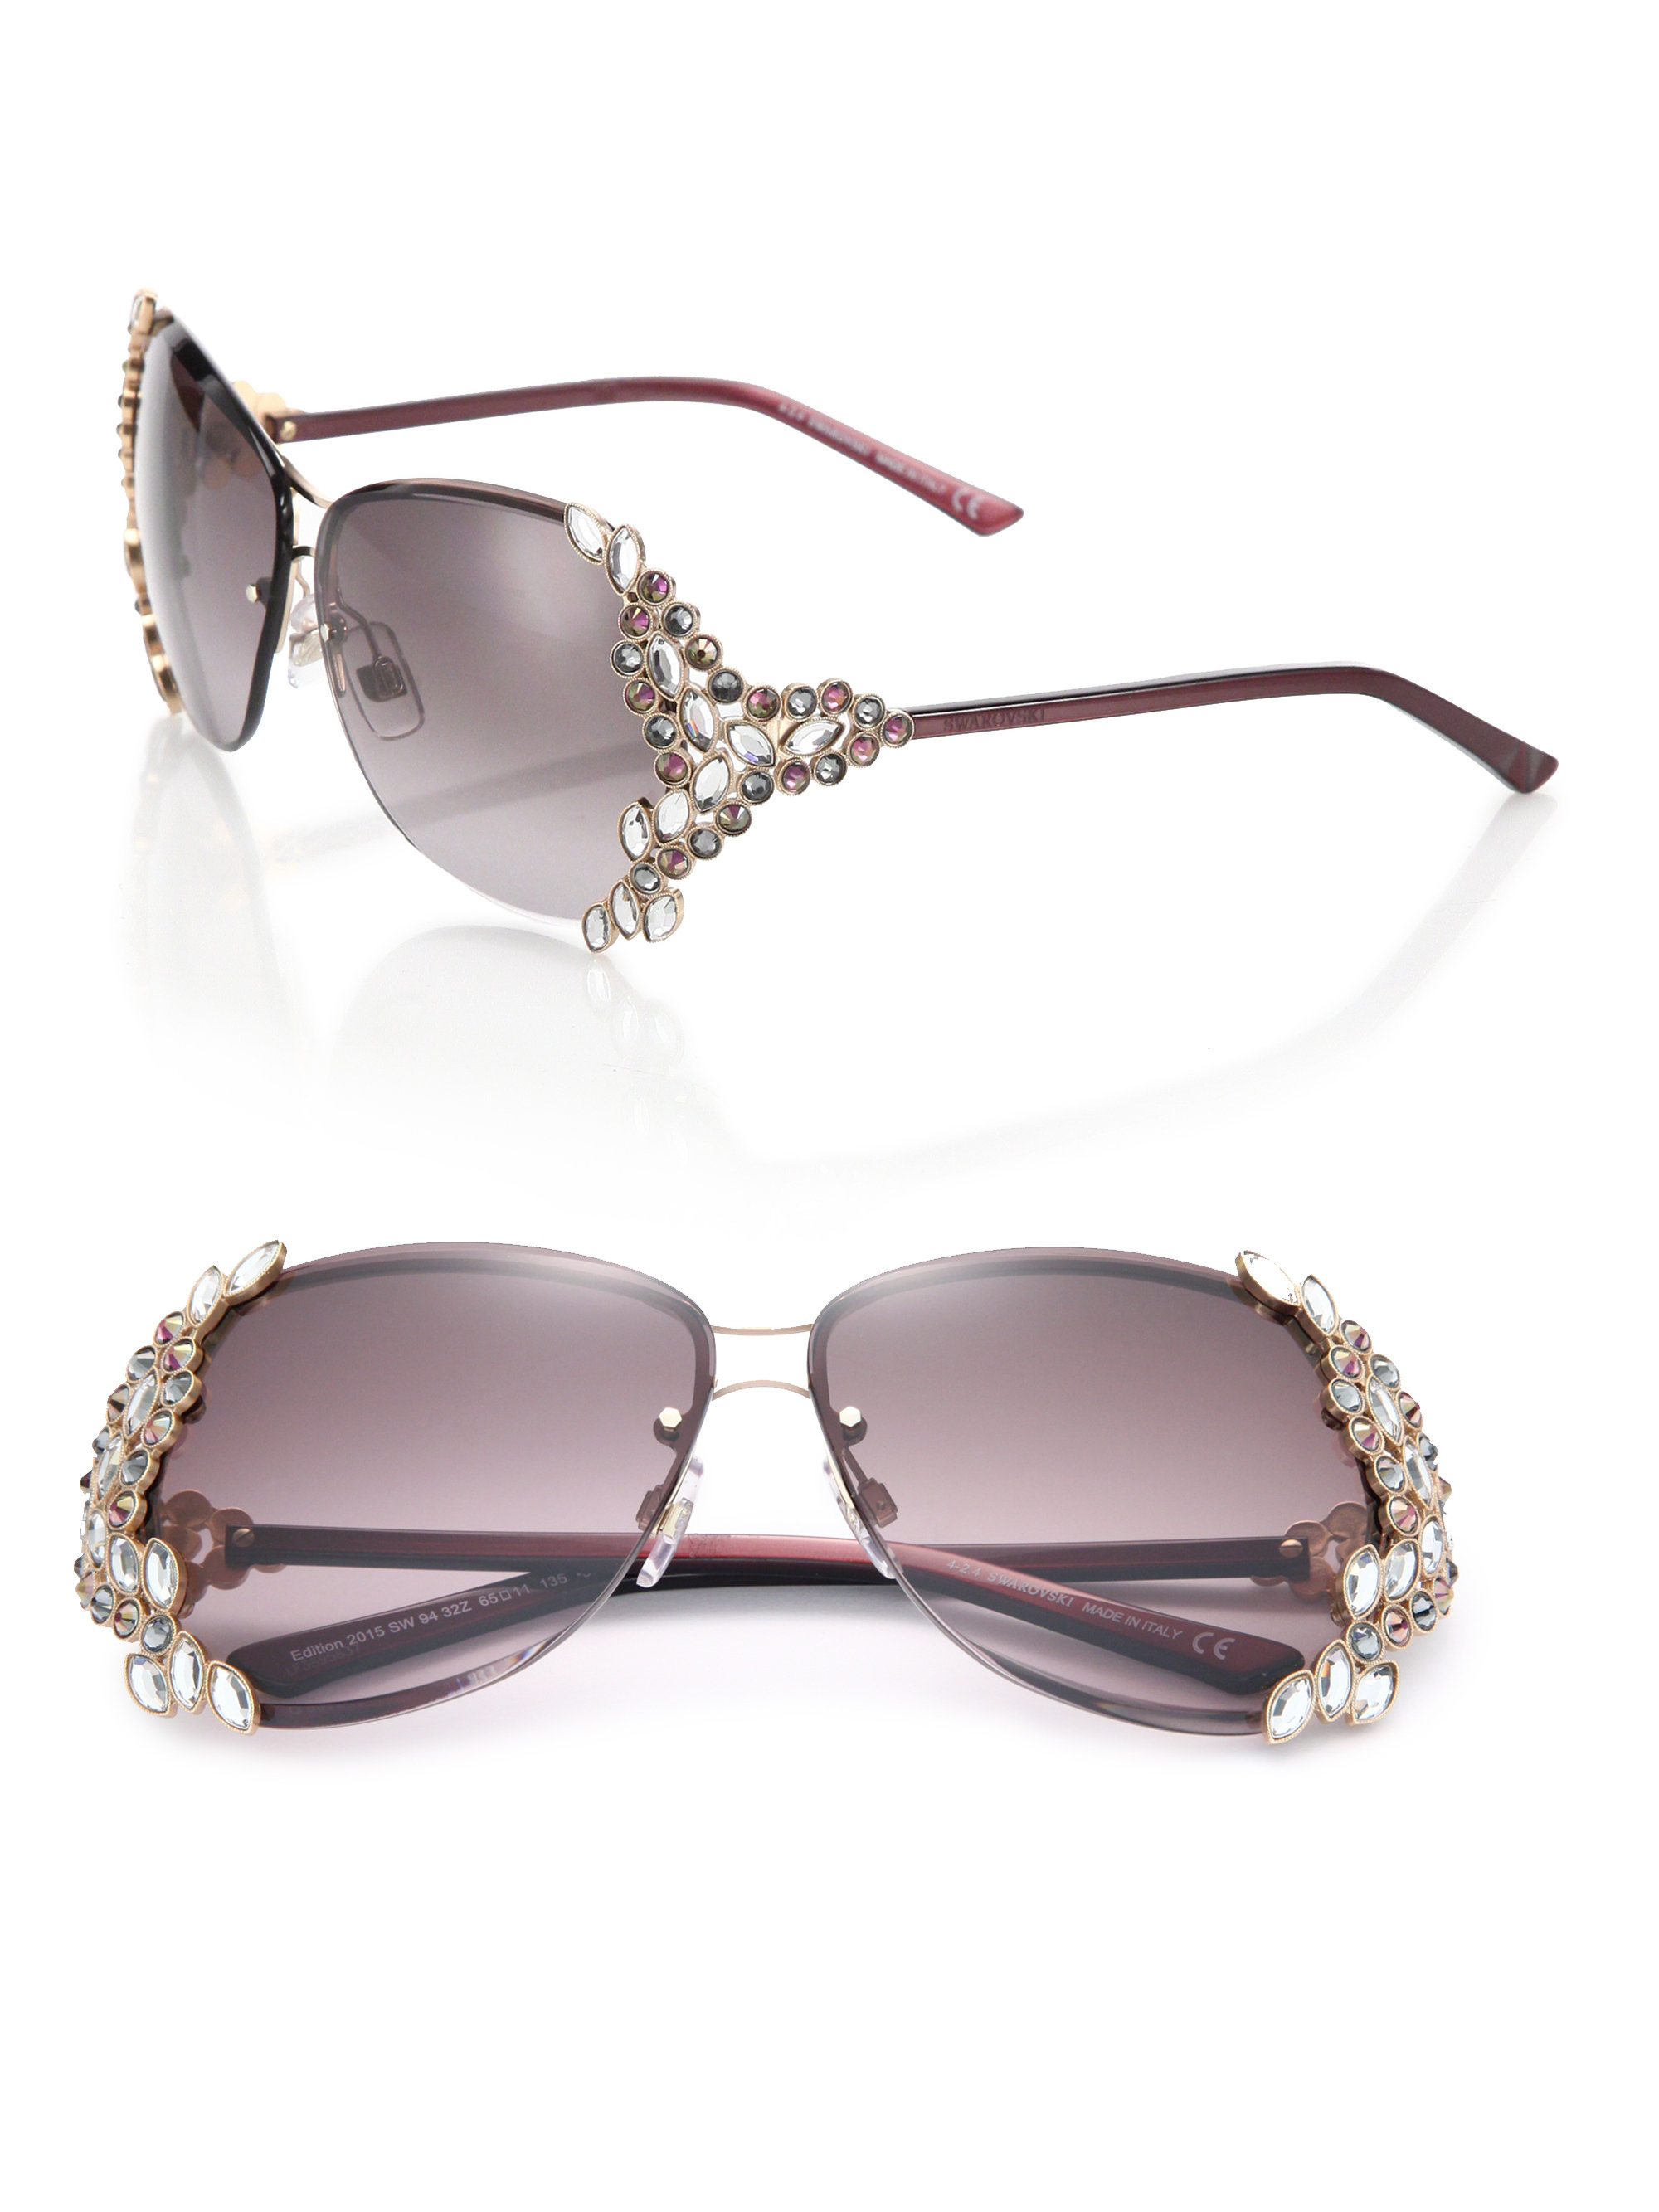 a546e52cc5f Lyst - Swarovski Special Edition 65mm Crystal Sunglasses in Black